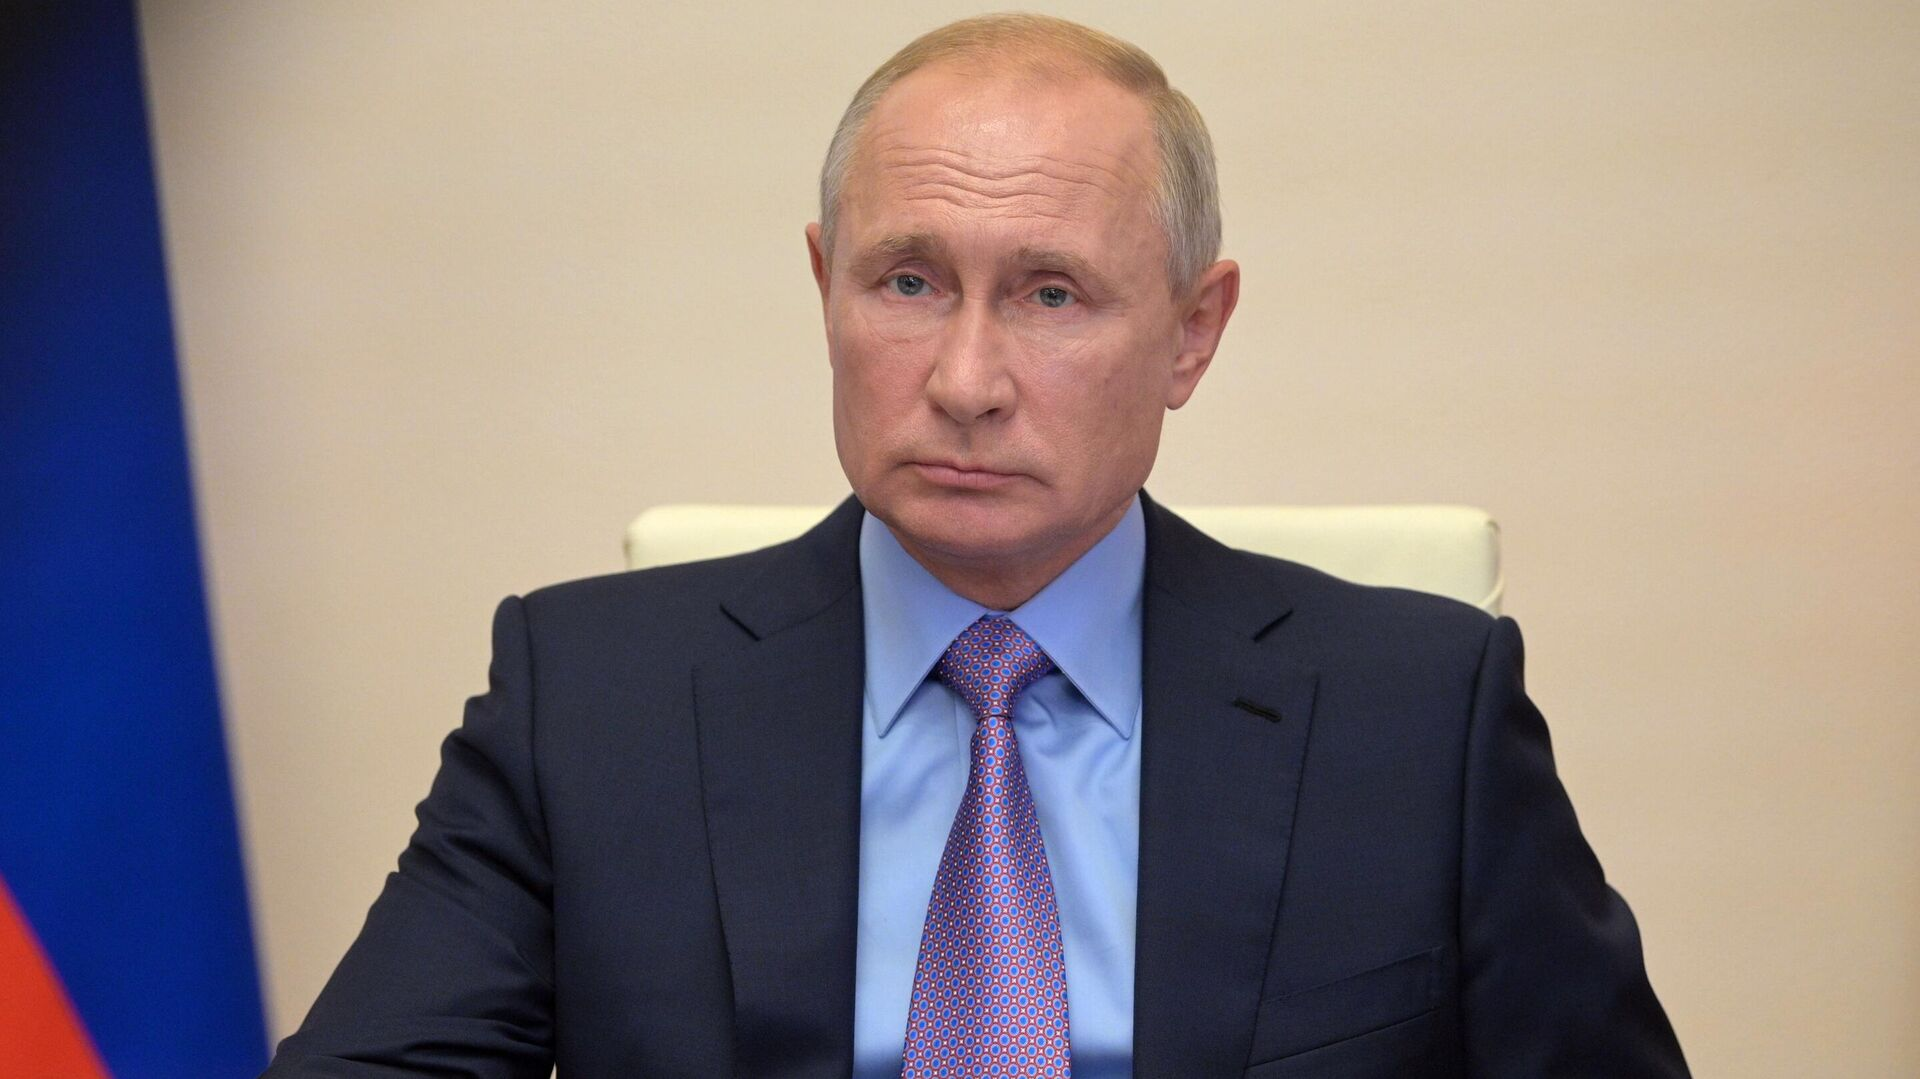 Президент РФ Владимир Путин - РИА Новости, 1920, 20.07.2020